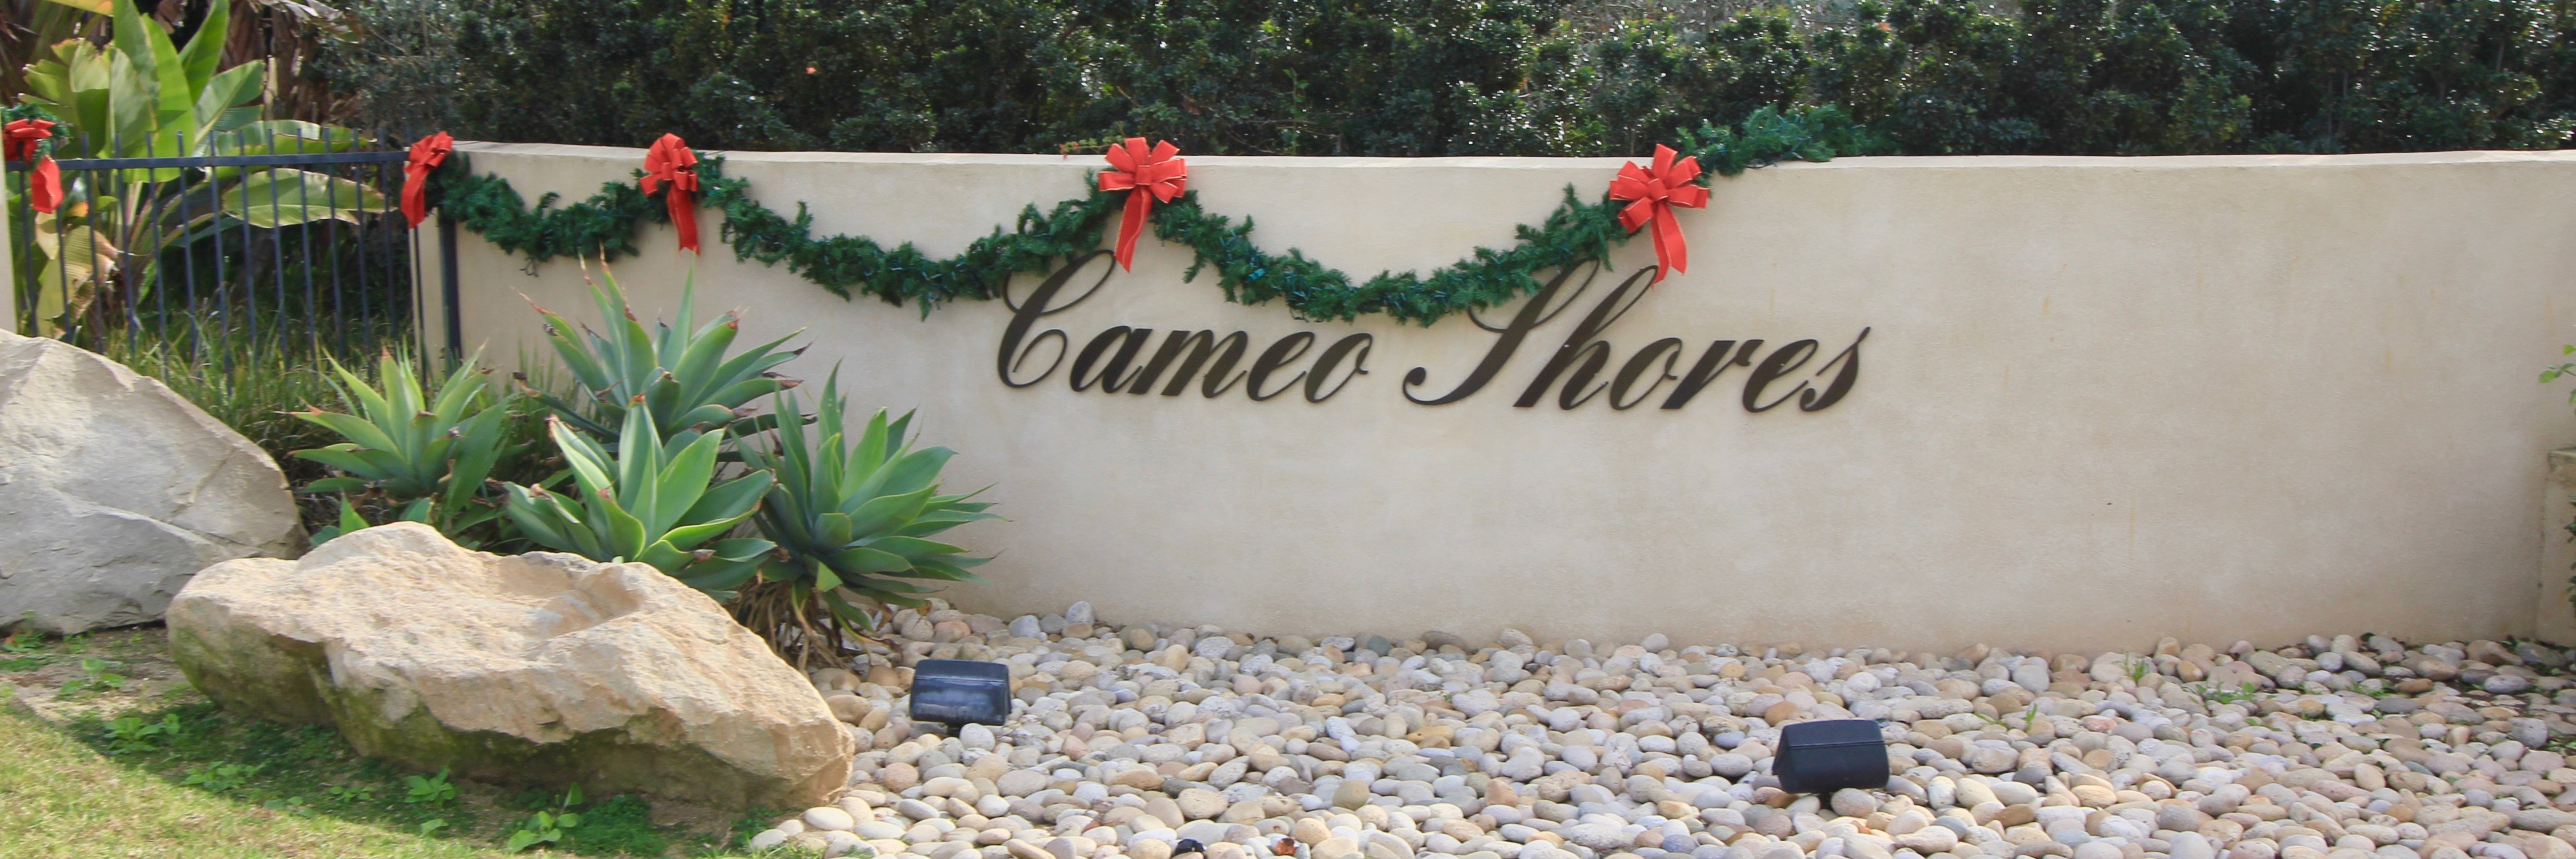 Camino Shores is a high end home community in Corona Del Mar CA